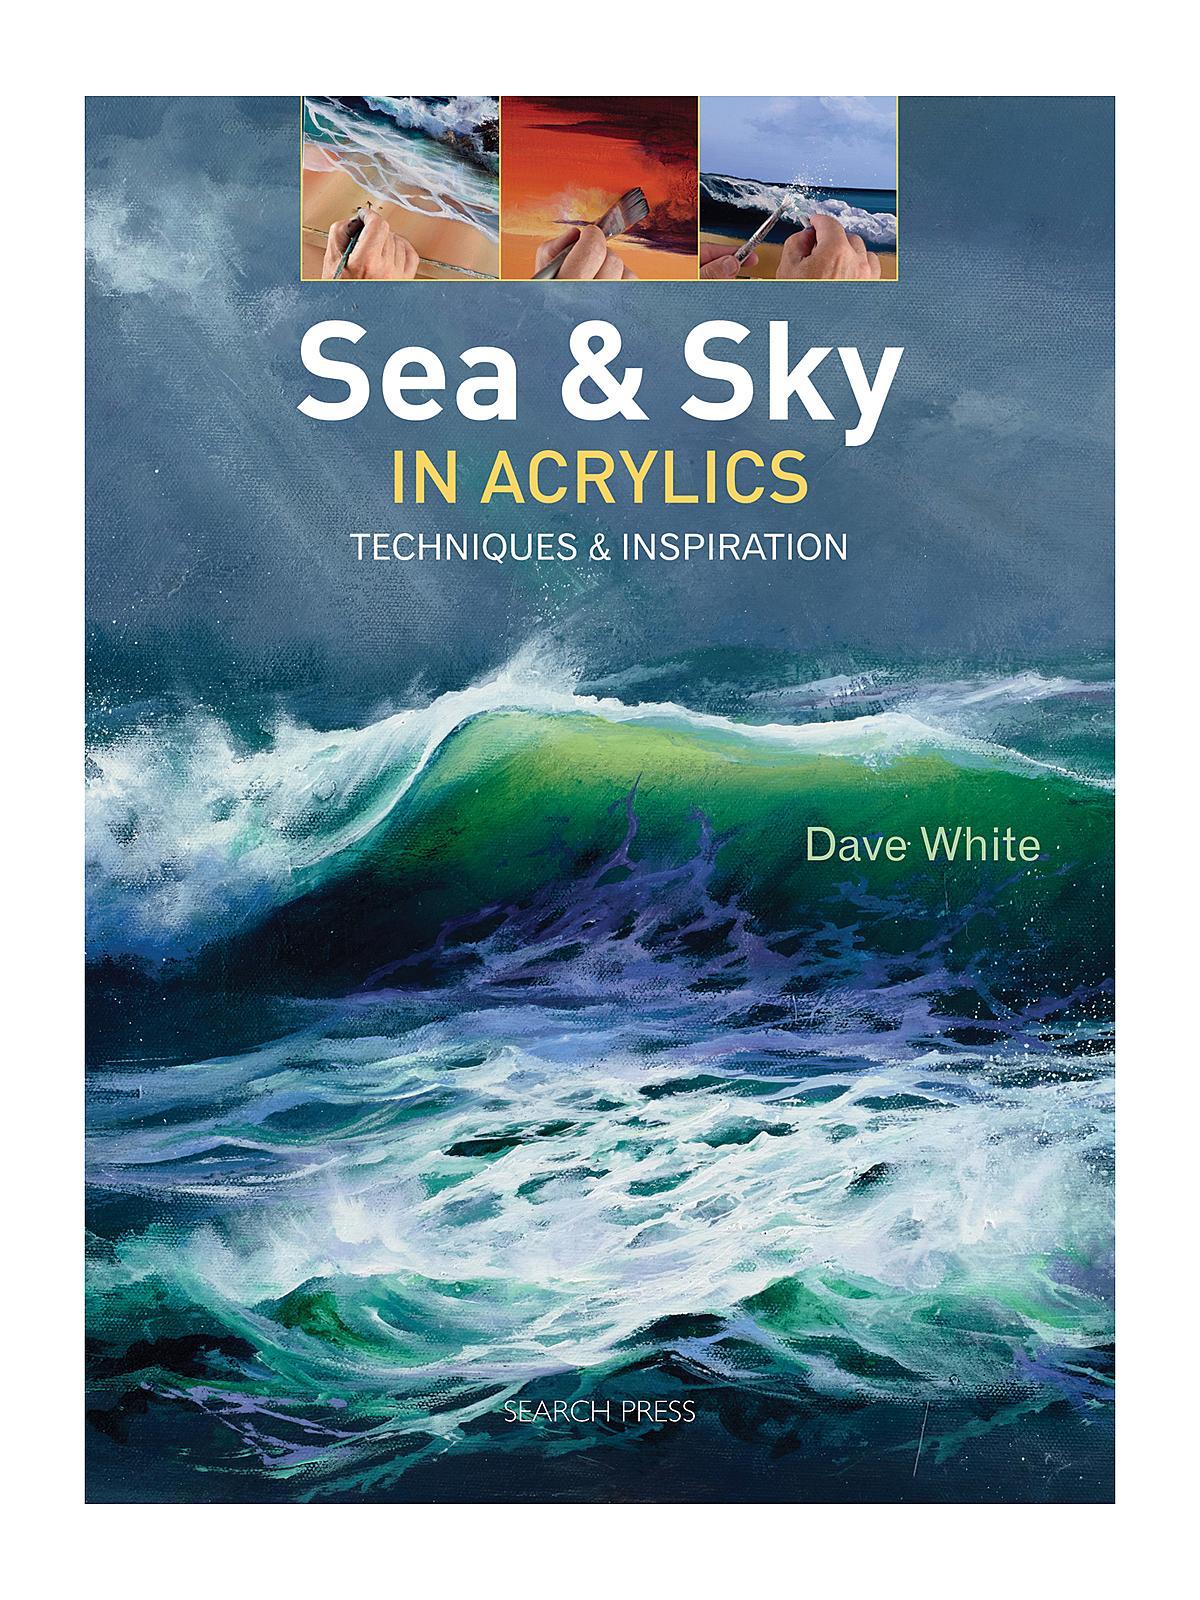 Search Press - Sea & Sky in Acrylics